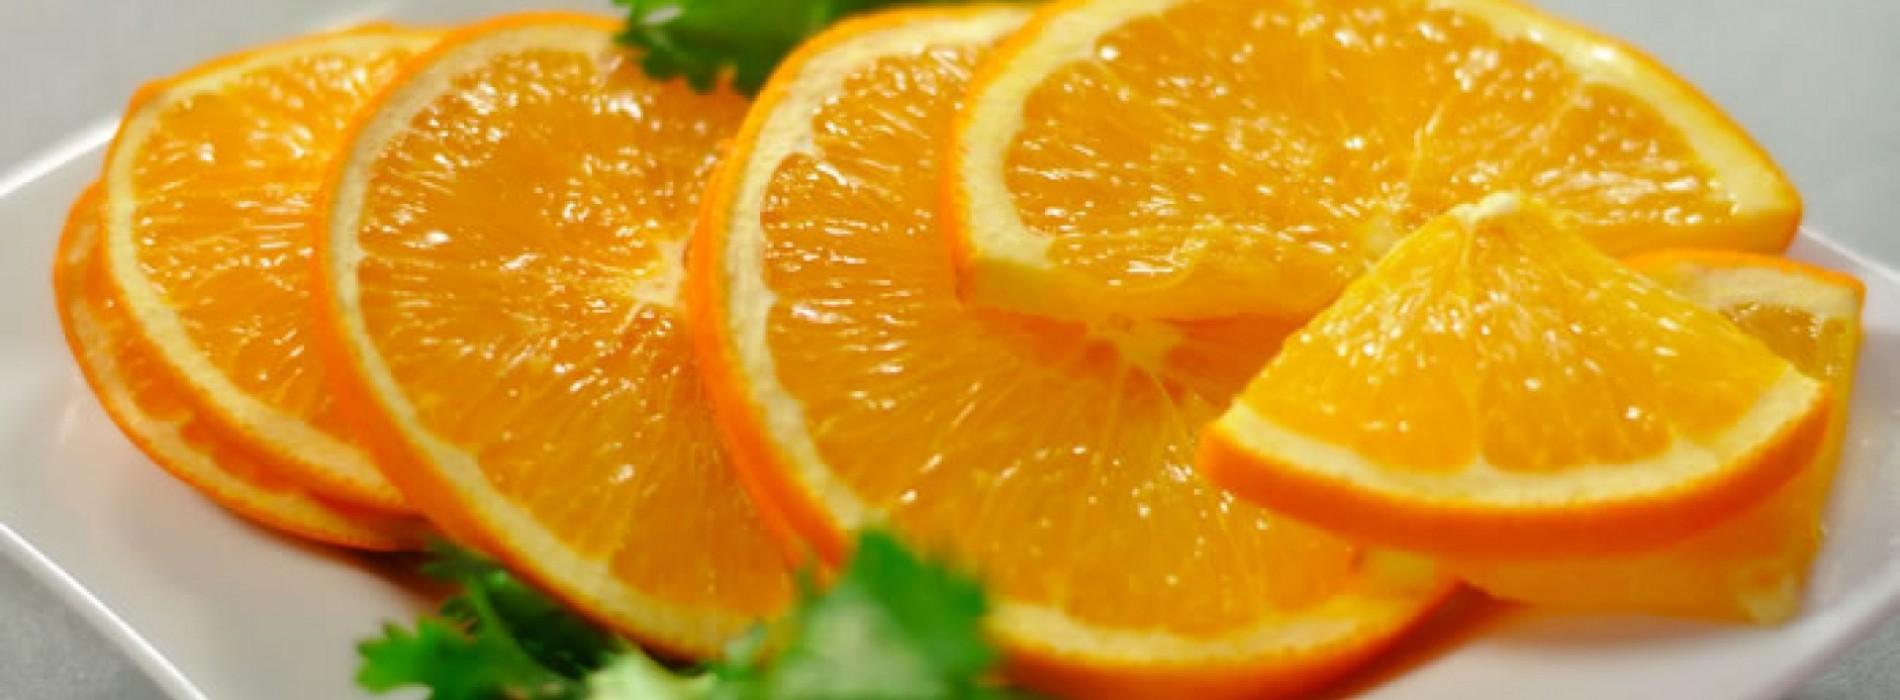 Sinaasappelsalade met olijven en peterselie